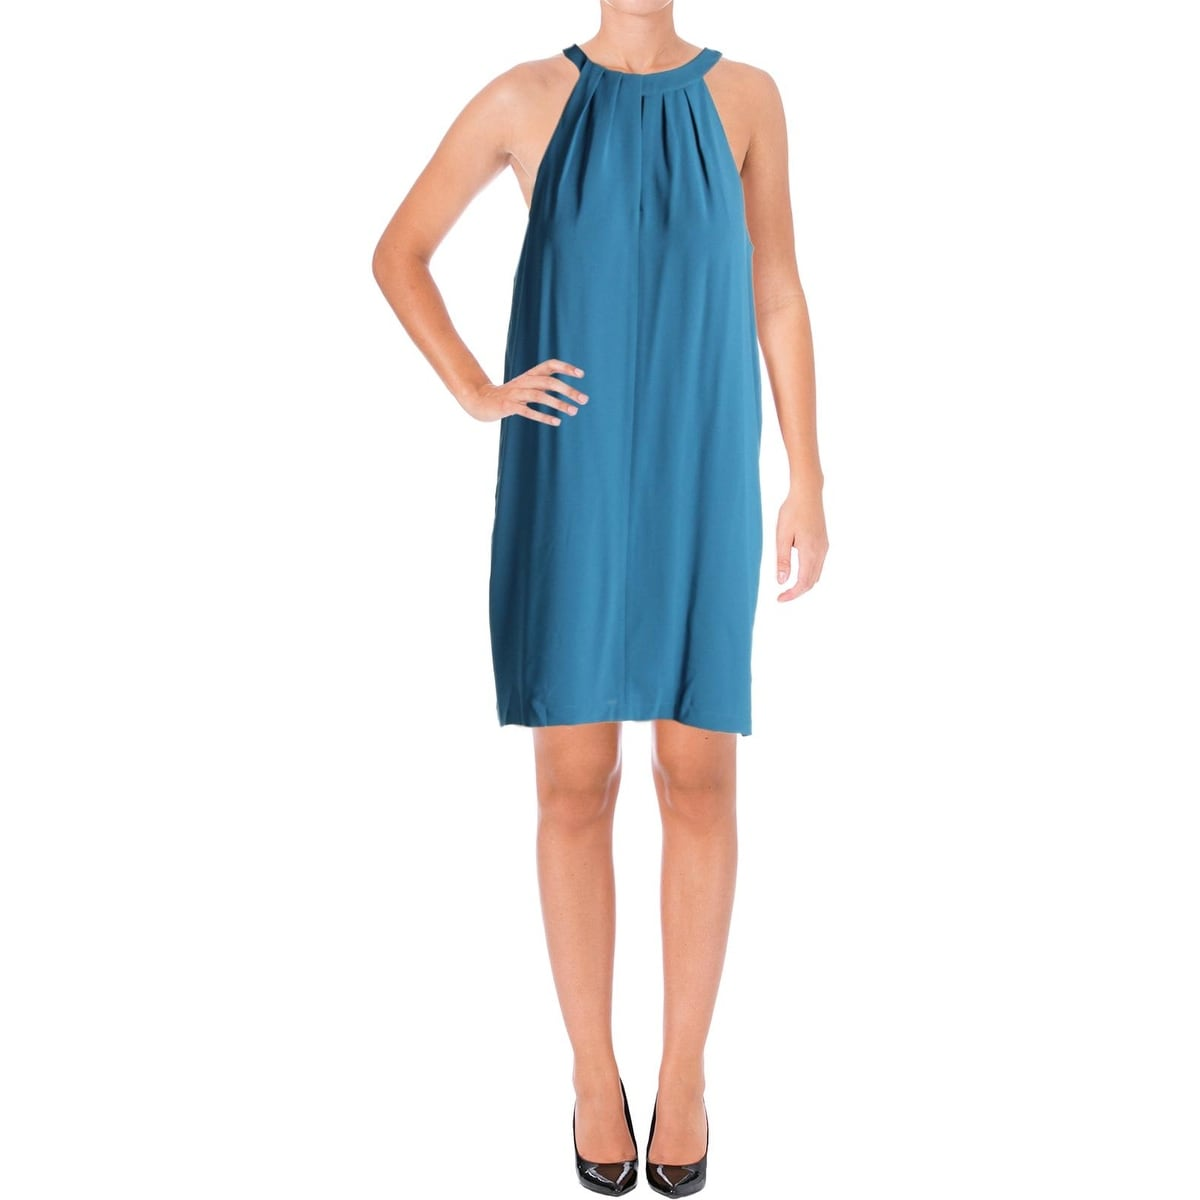 74c004a534 Shop BCBG Max Azria Womens Tristyn Cocktail Dress Georgette Pleated ...